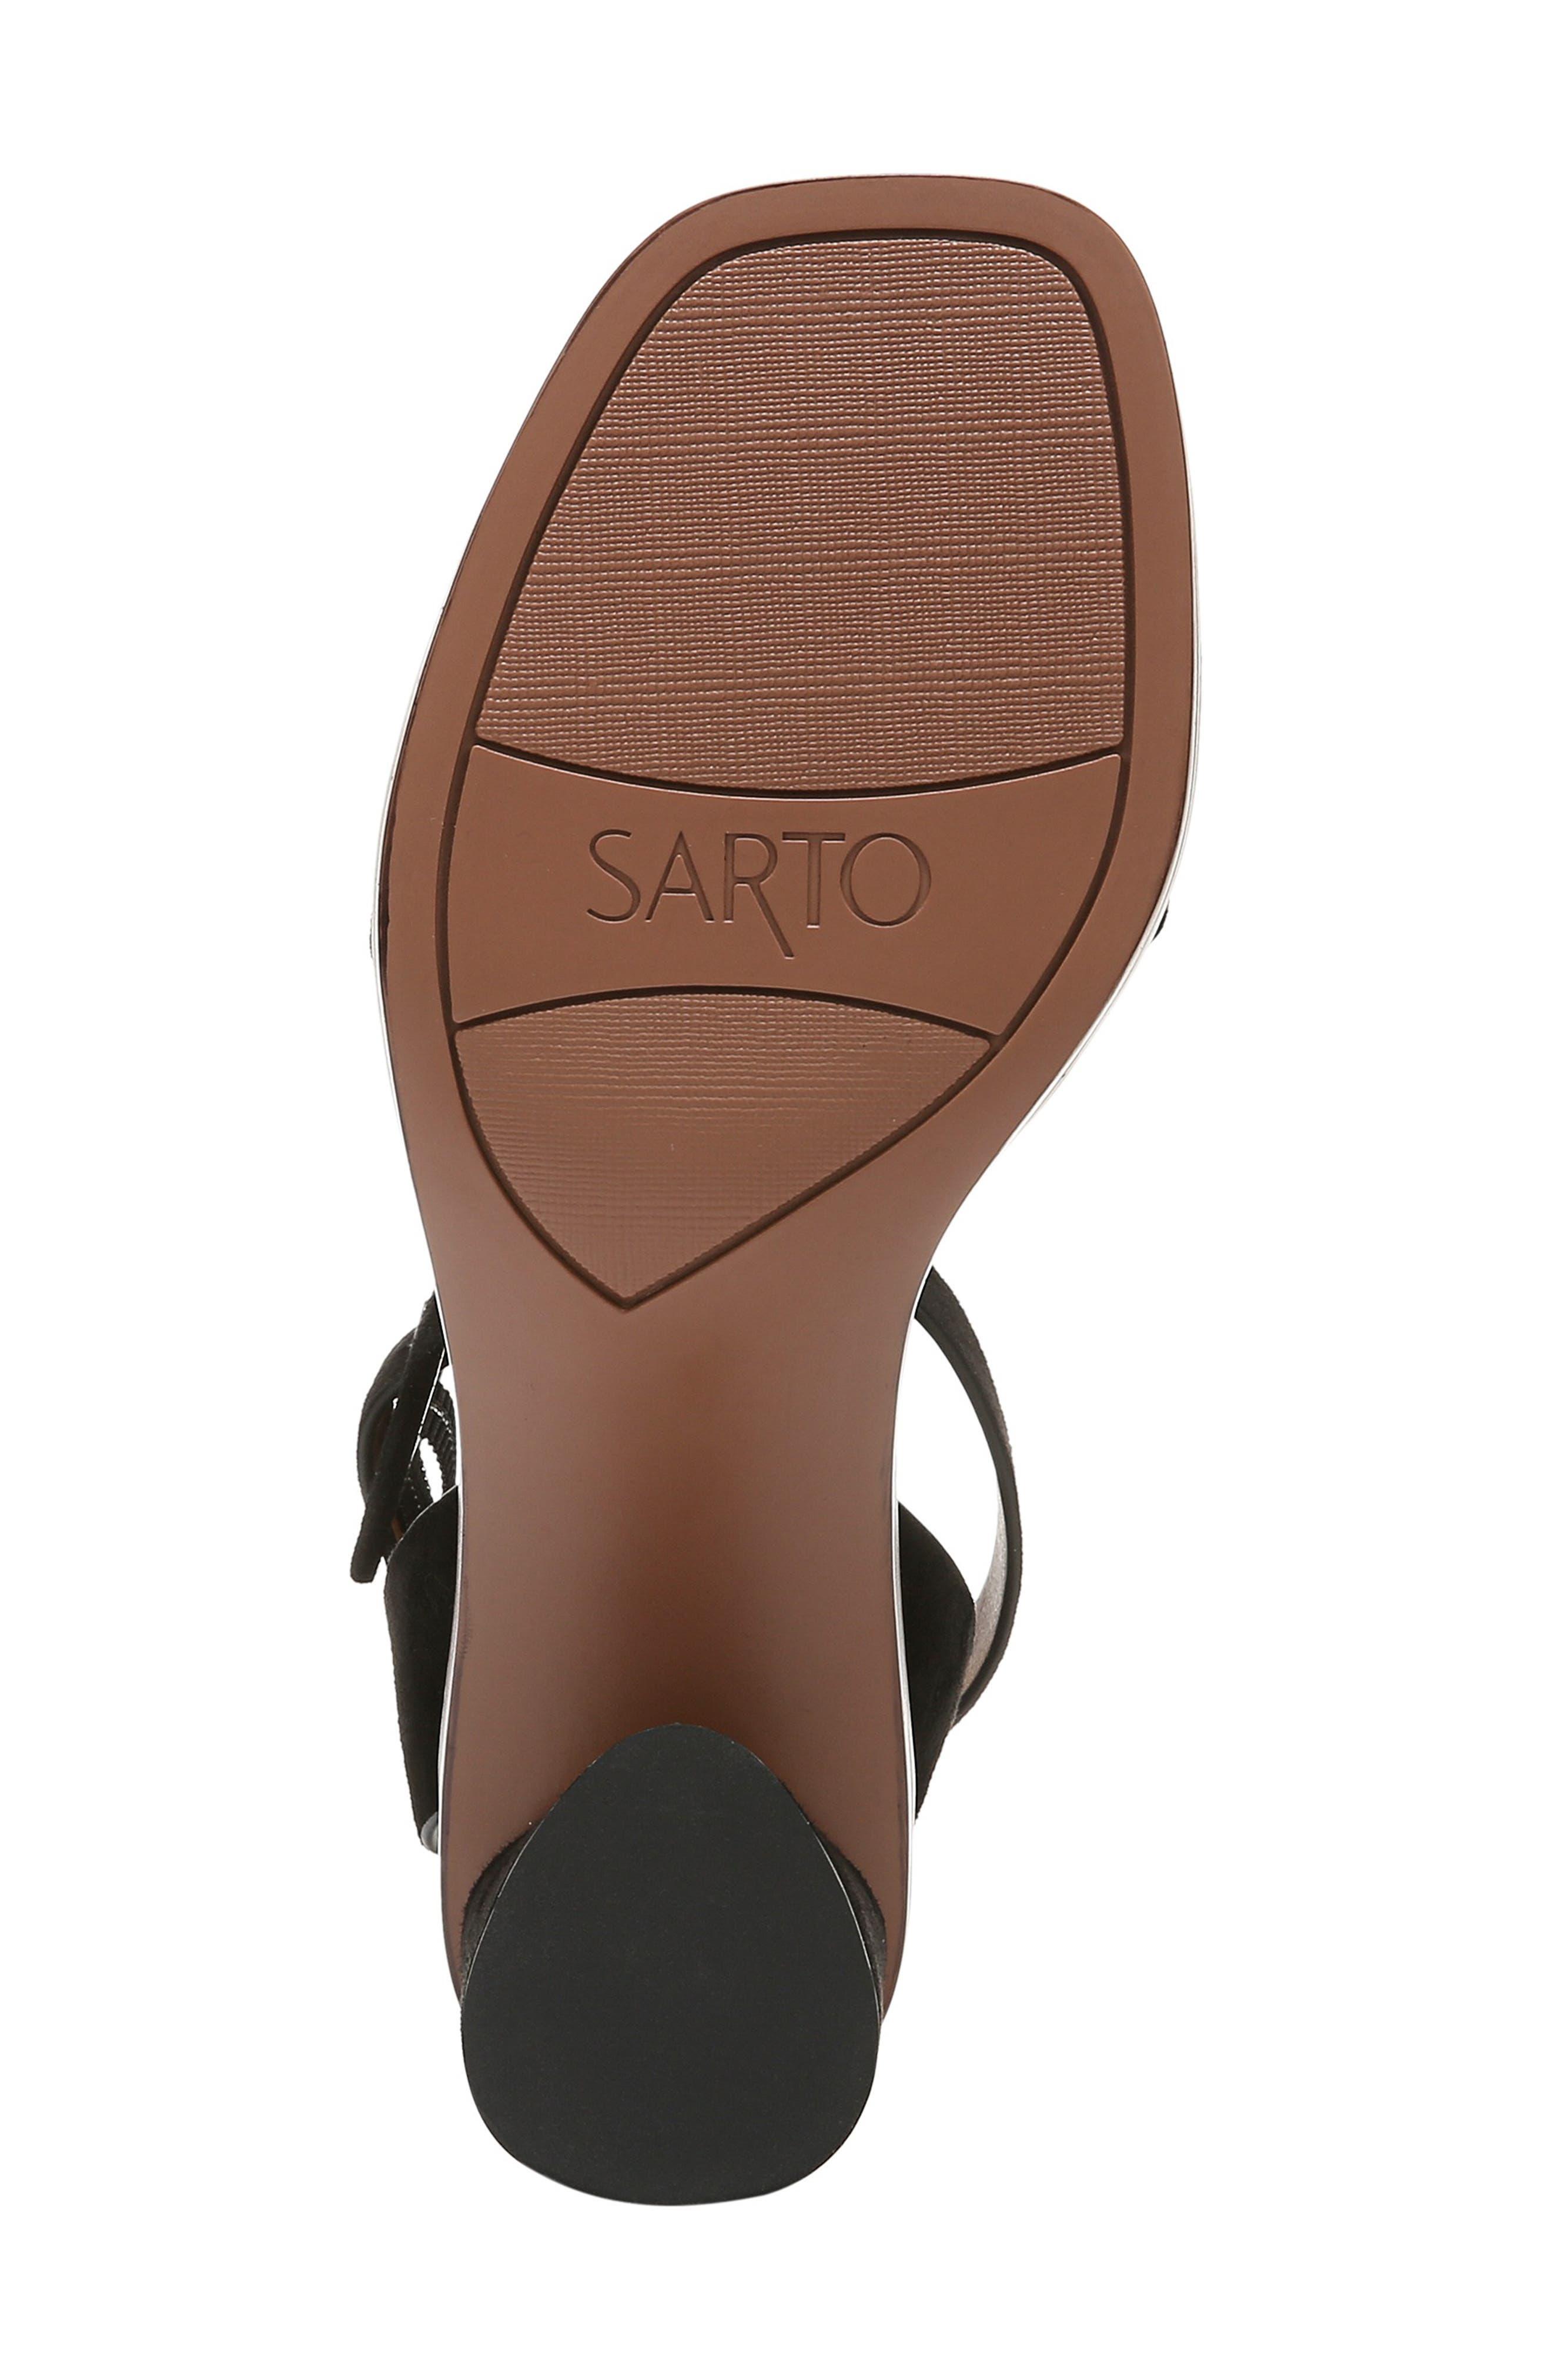 SARTO BY FRANCO SARTO, Risa Strap Sandal, Alternate thumbnail 6, color, BLACK SUEDE